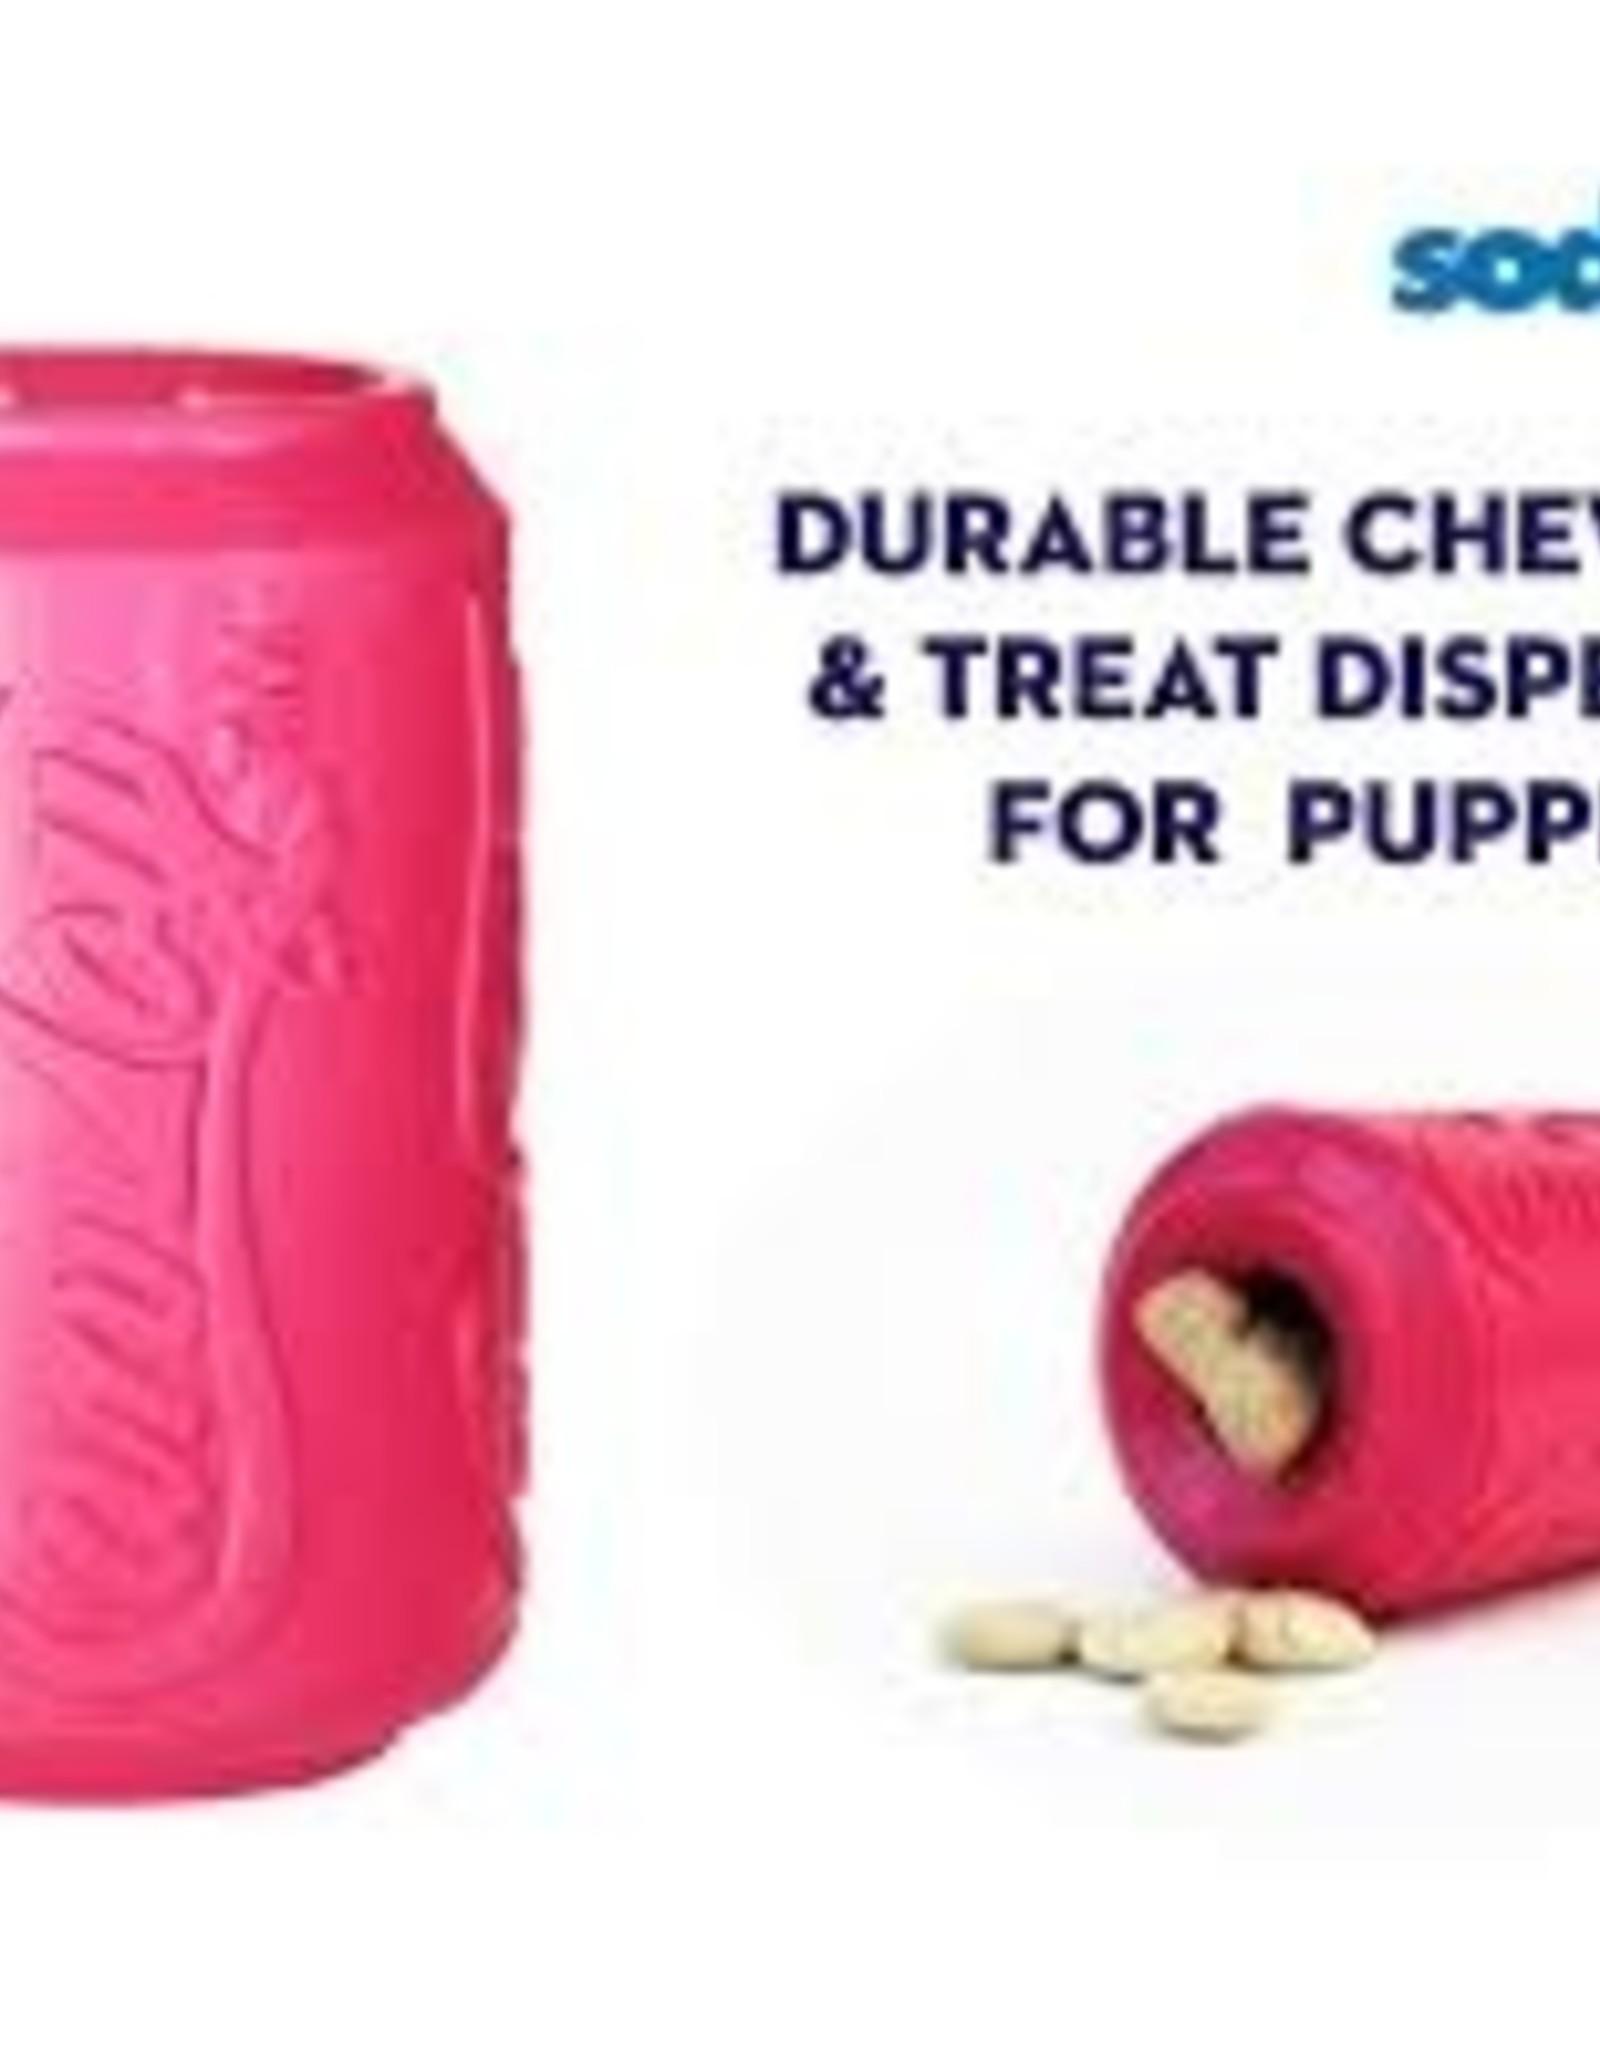 Sodapup Sodapup Puppy Treat Dispenser & Chew Toy Lrg